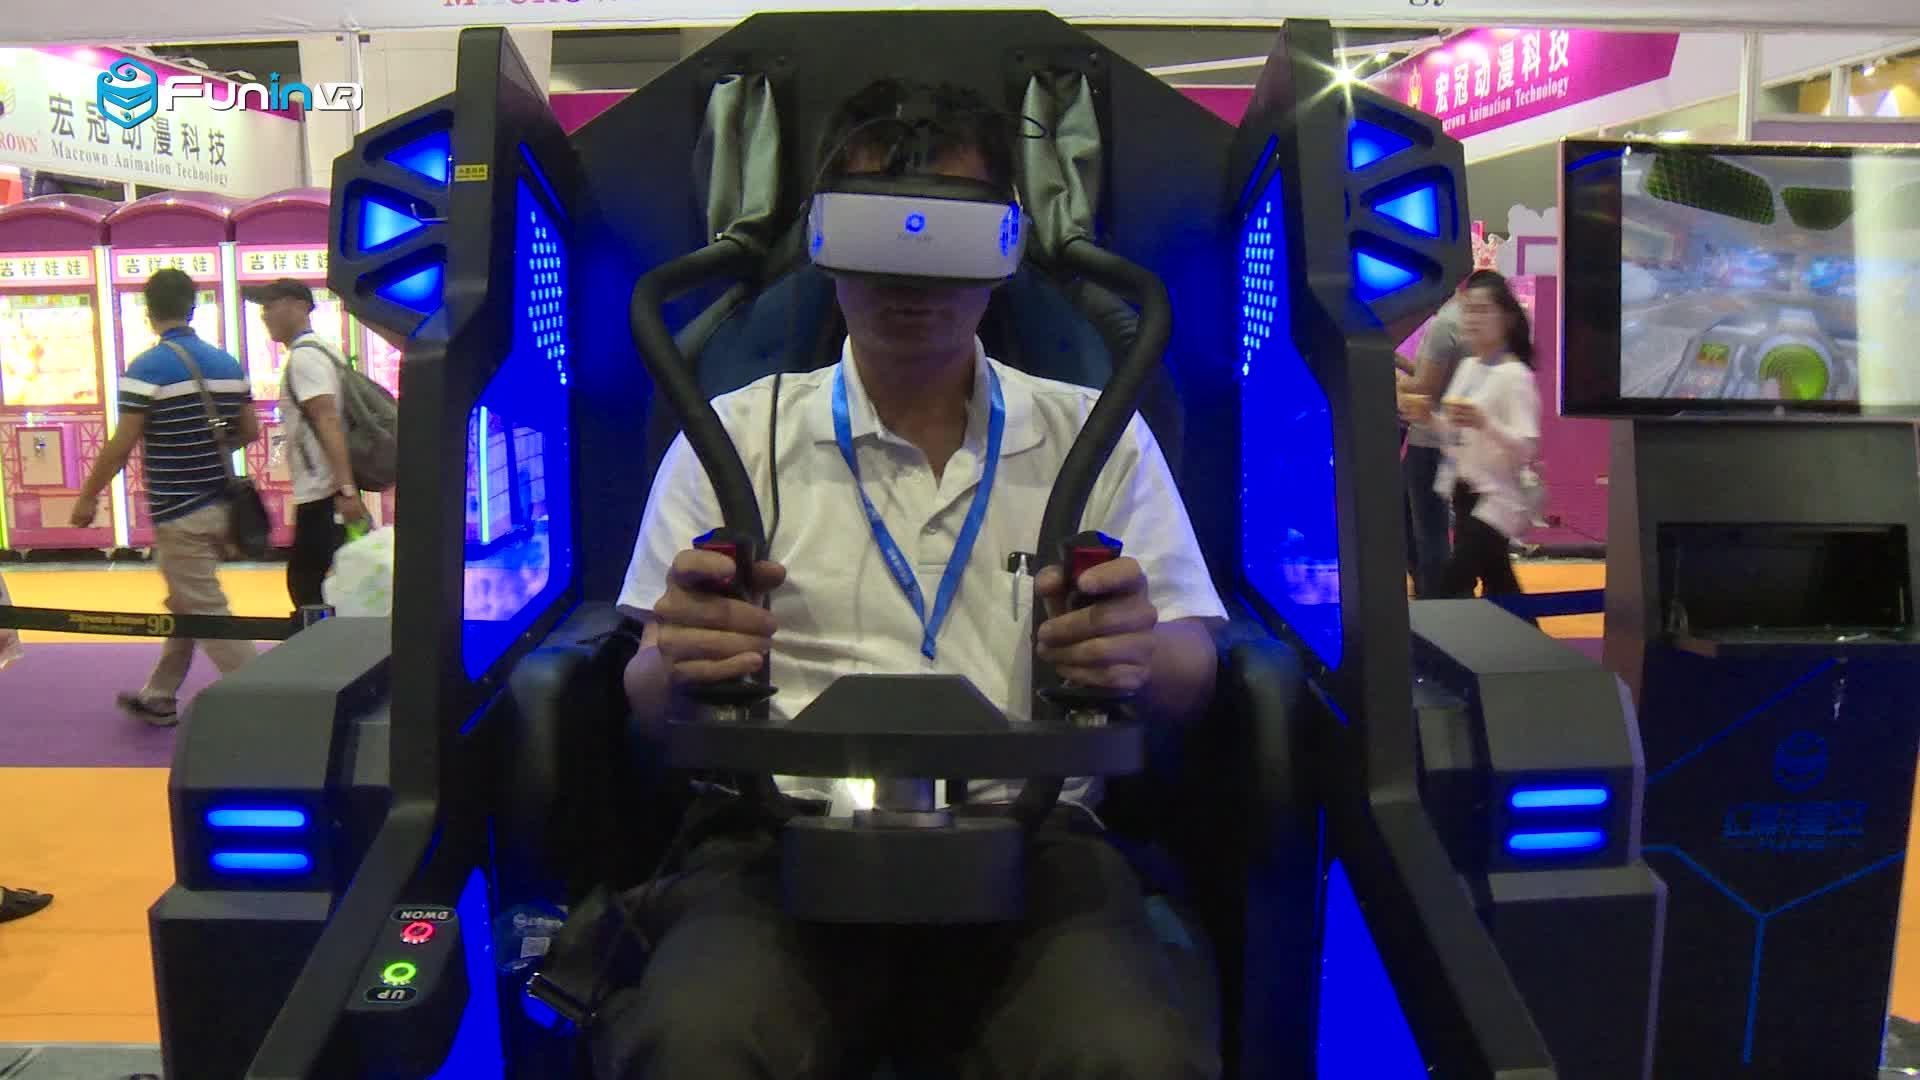 Factory price VR Mecha Simulator machine updated technology with interactive motion platform